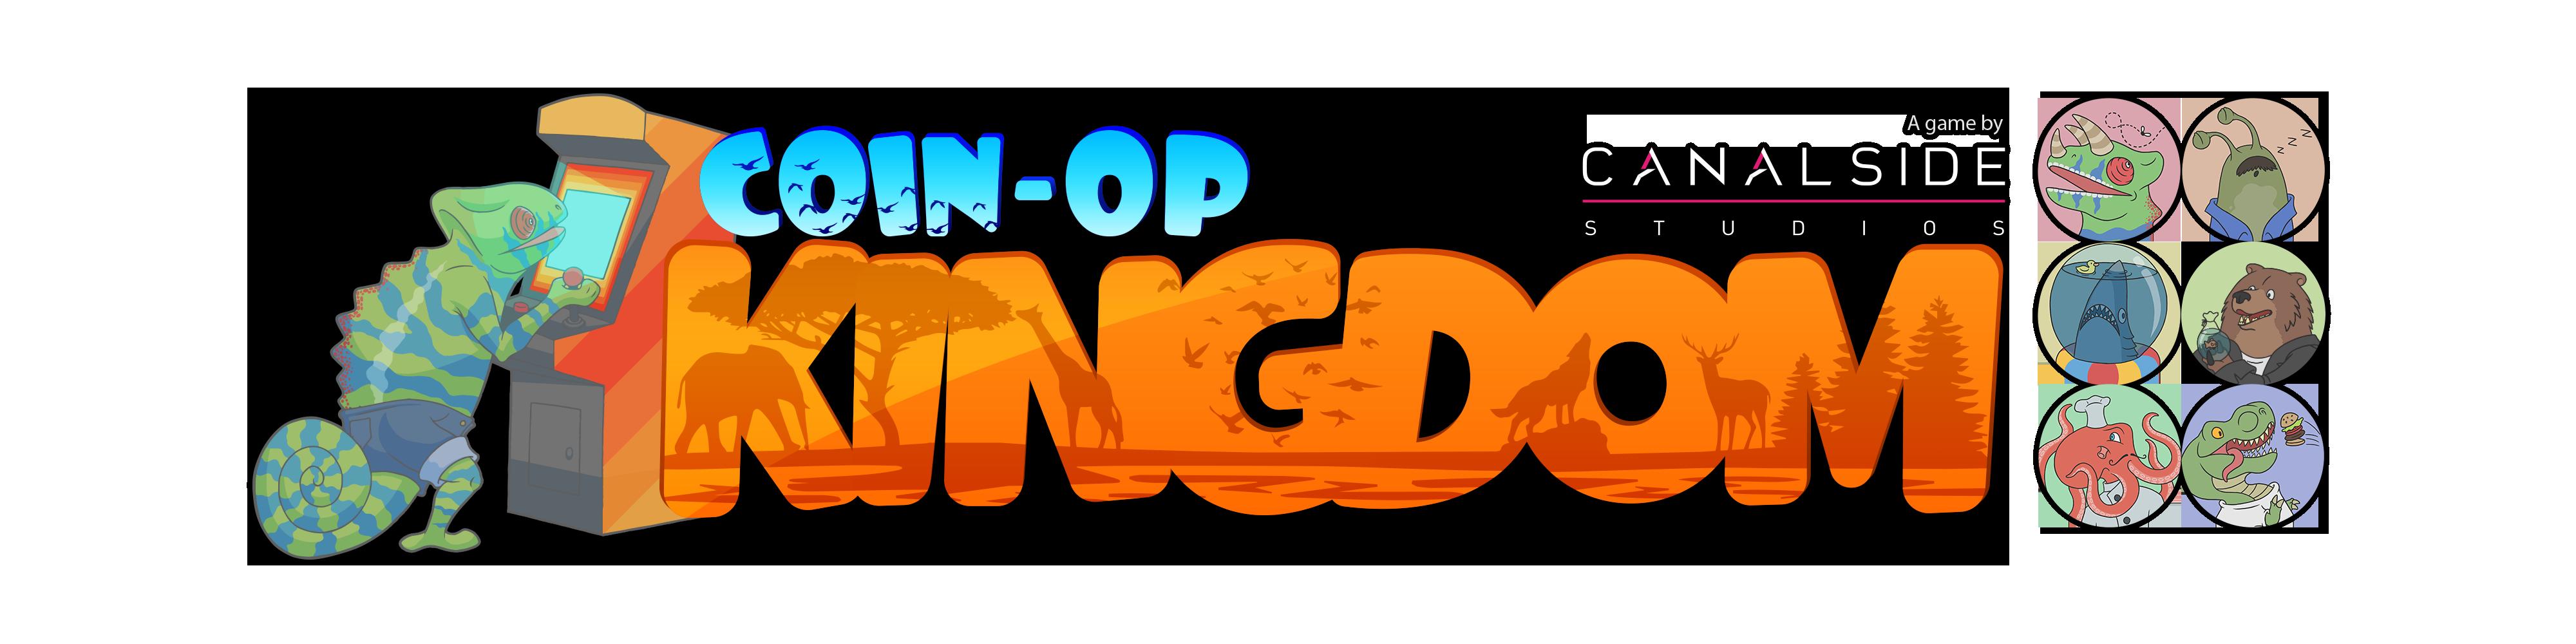 Coin-Op Kingdom